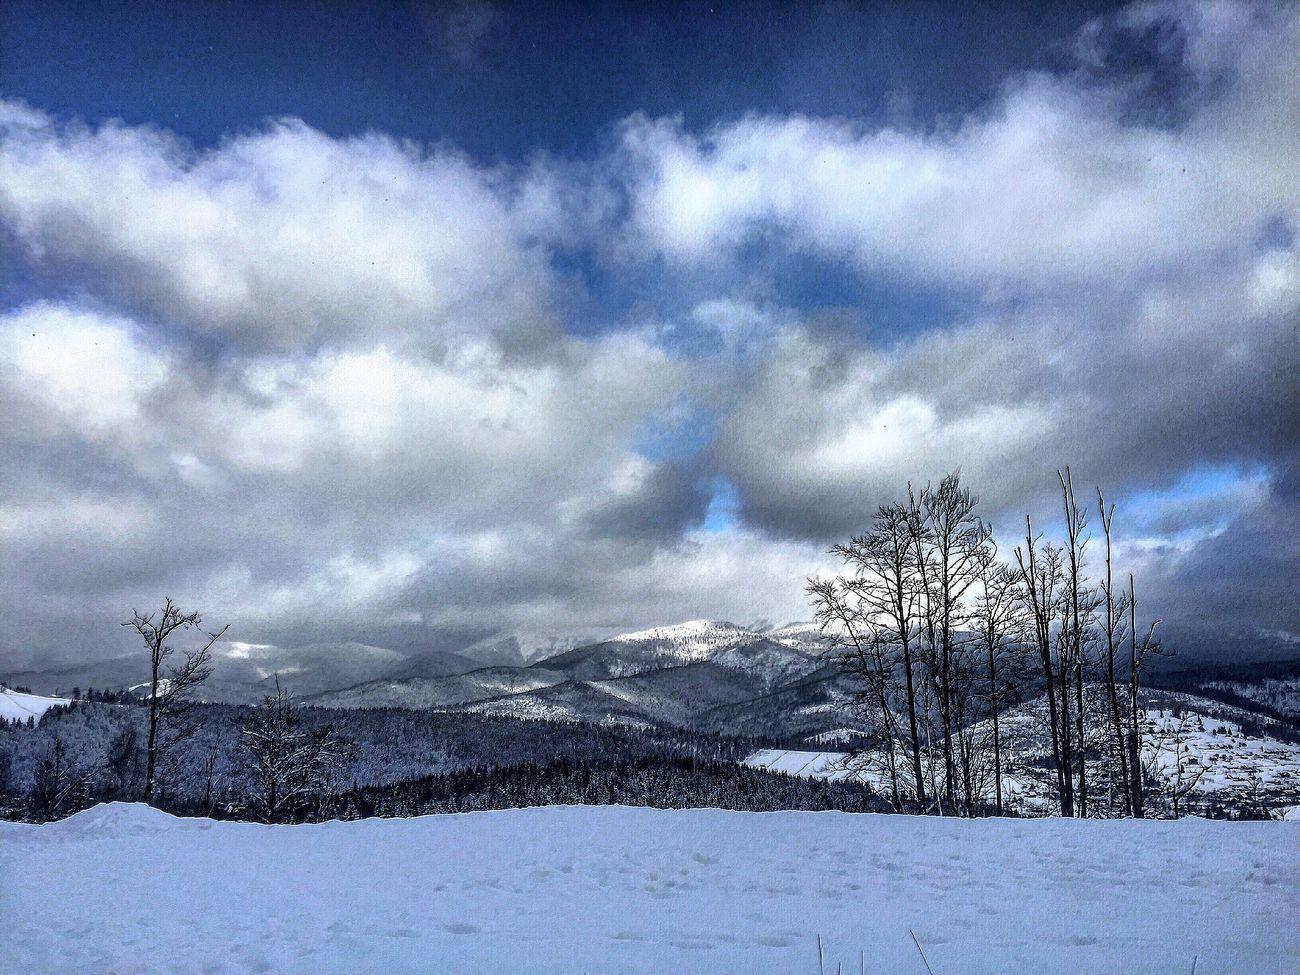 Mountains Bukovel Karpaty Karpathian F4F L4l Followforfollow Like4like Follow4follow Happiness ♡